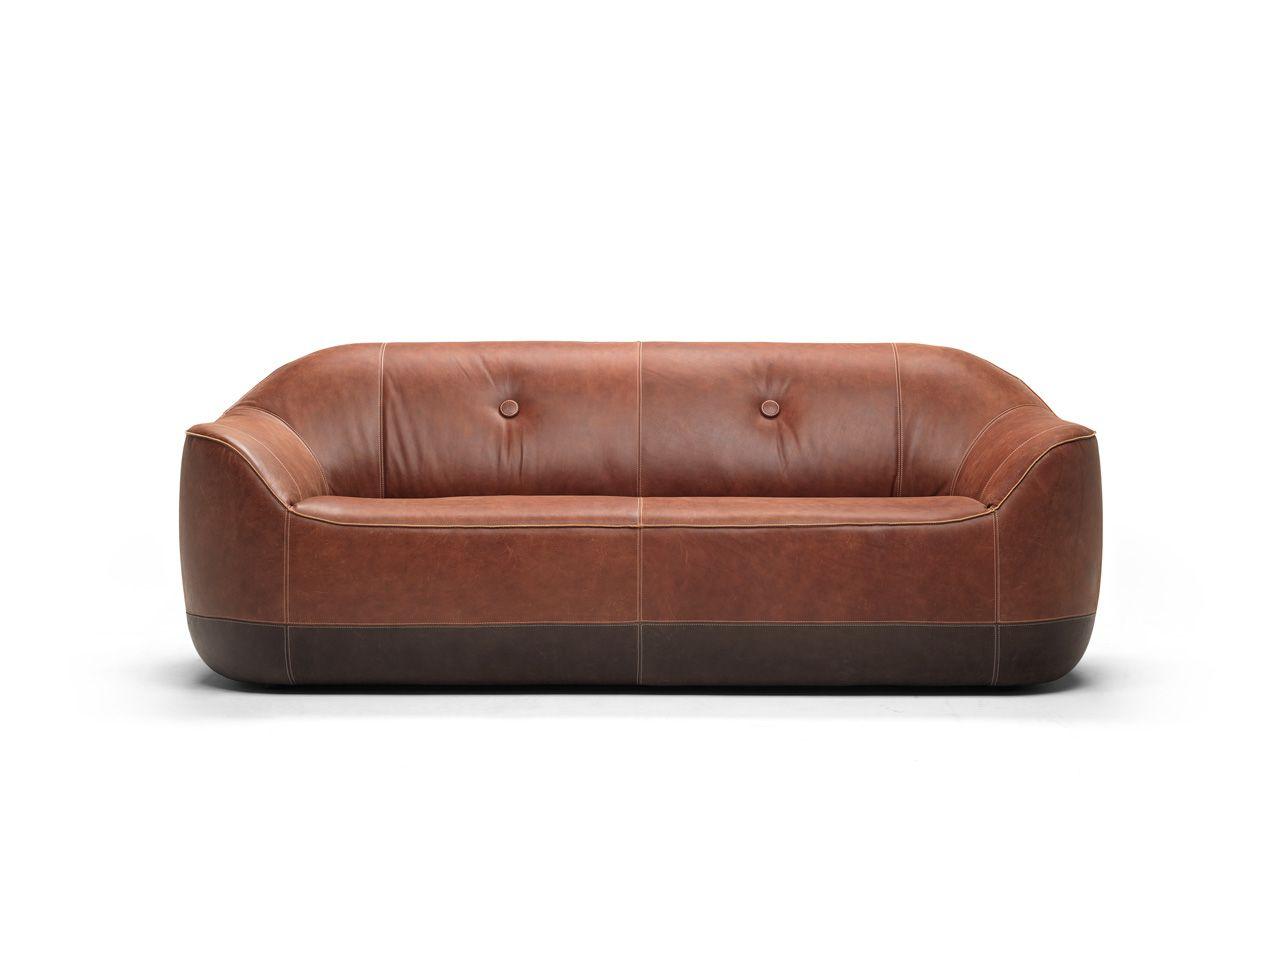 Design Bank Natuzzi.The Cozy Furrow Sofa By Marcel Wanders For Natuzzi Italia Sofa